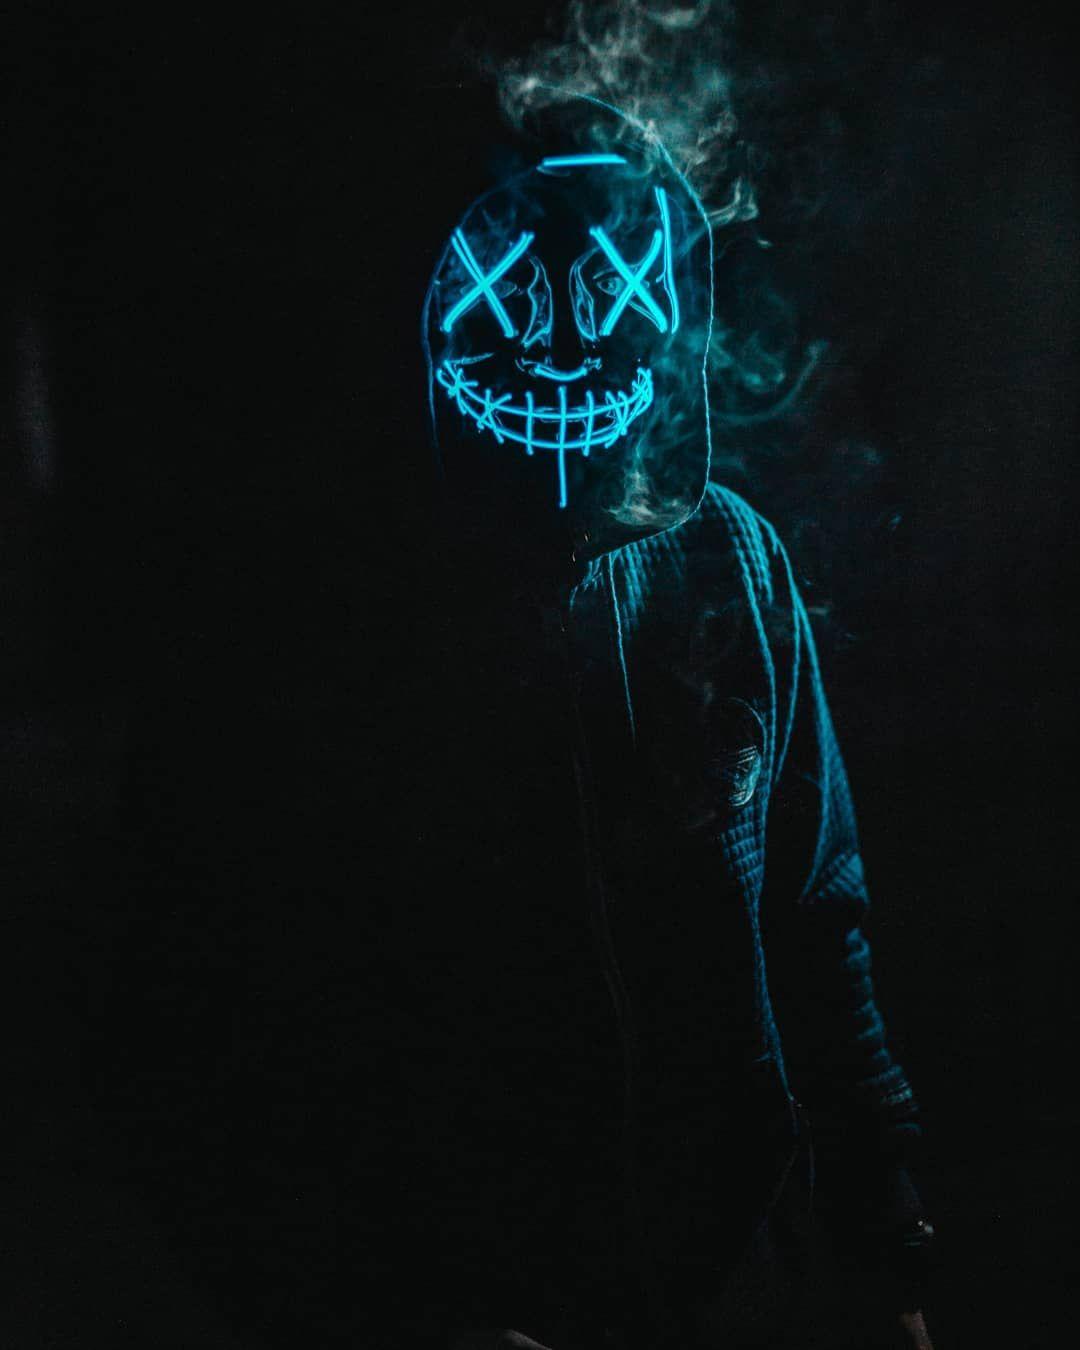 blue led purge mask wallpaper